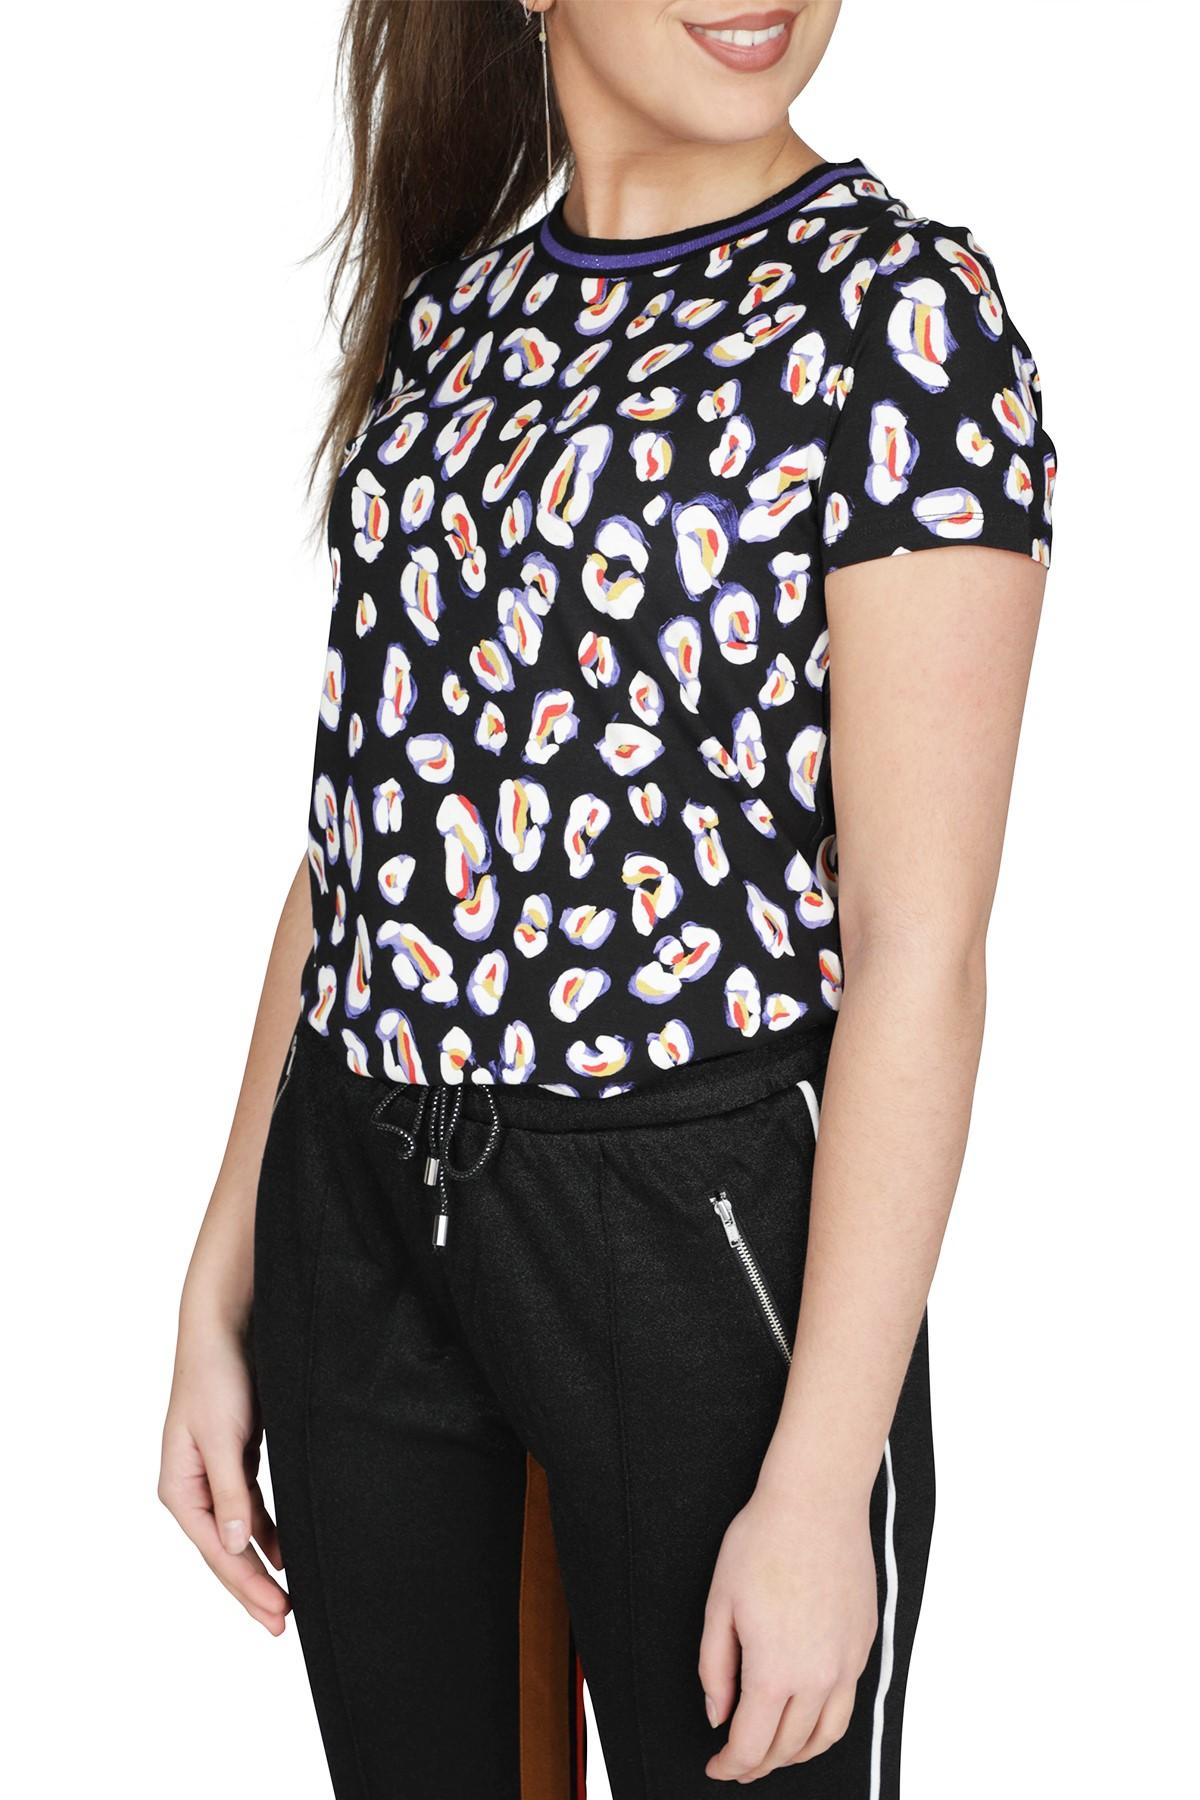 Afbeelding van AAIKO Shirt / Top Multicolor Alicia